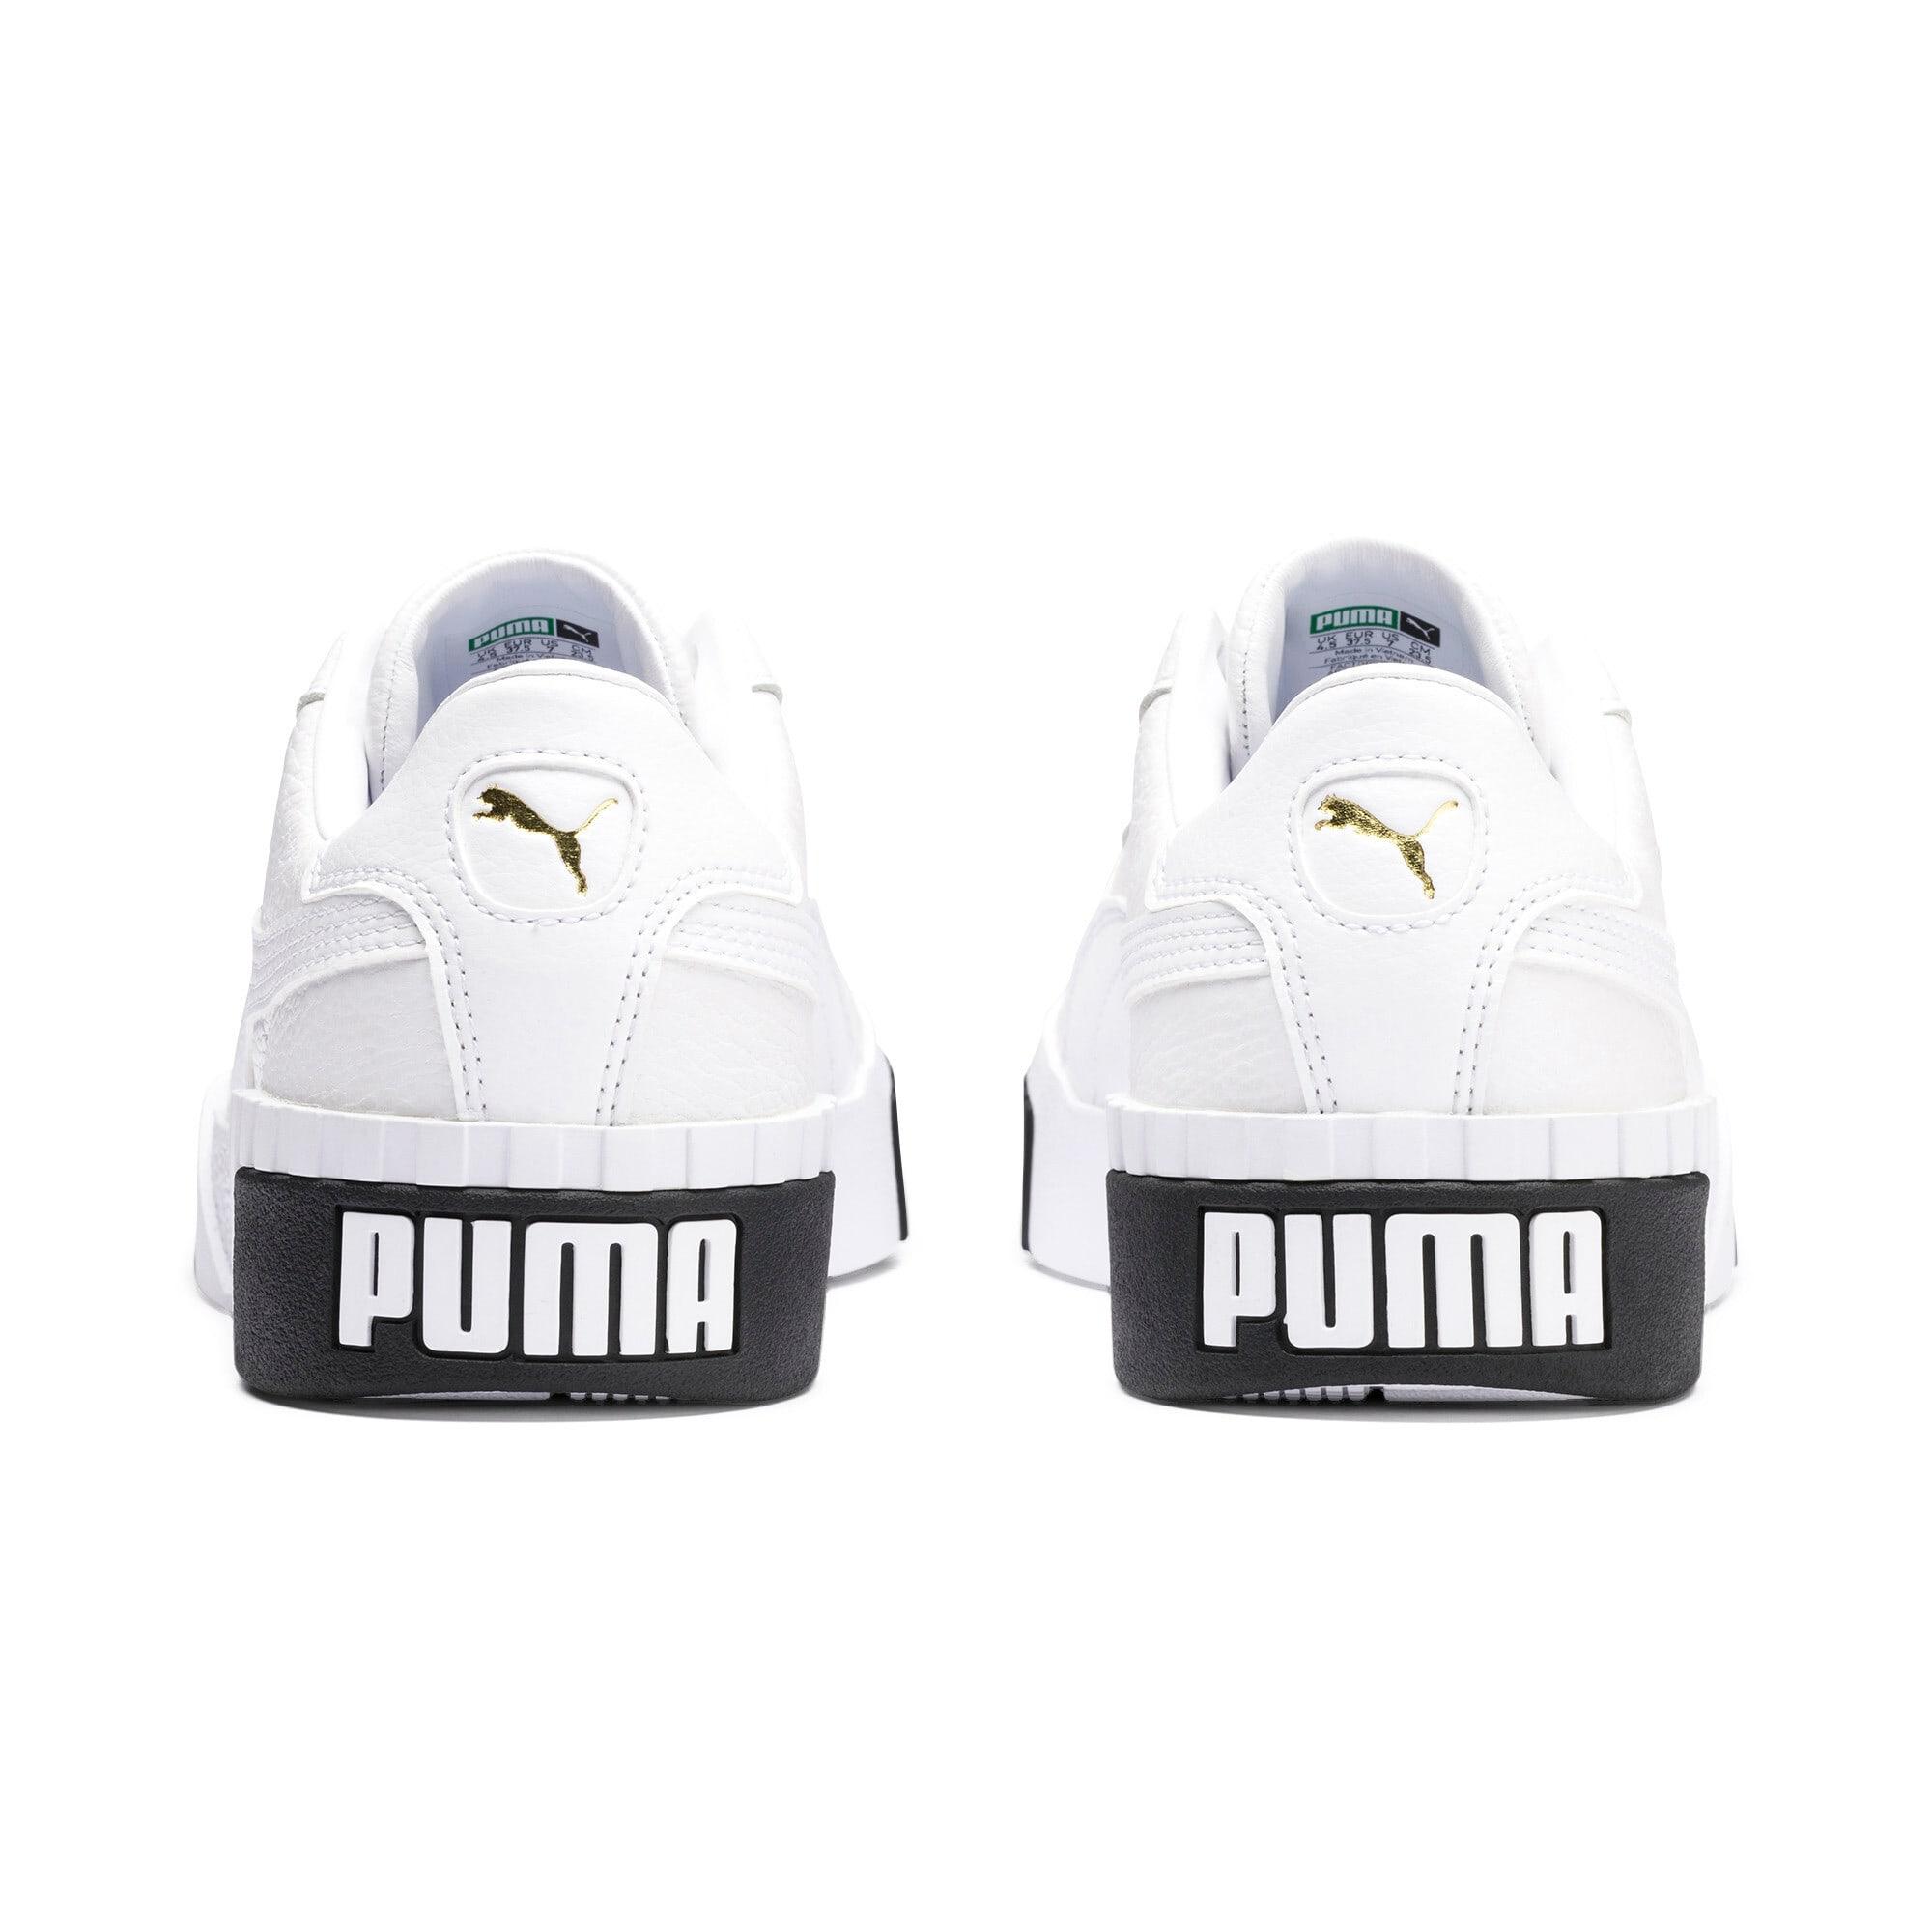 Thumbnail 4 of CALI ウィメンズ, Puma White-Puma Black, medium-JPN